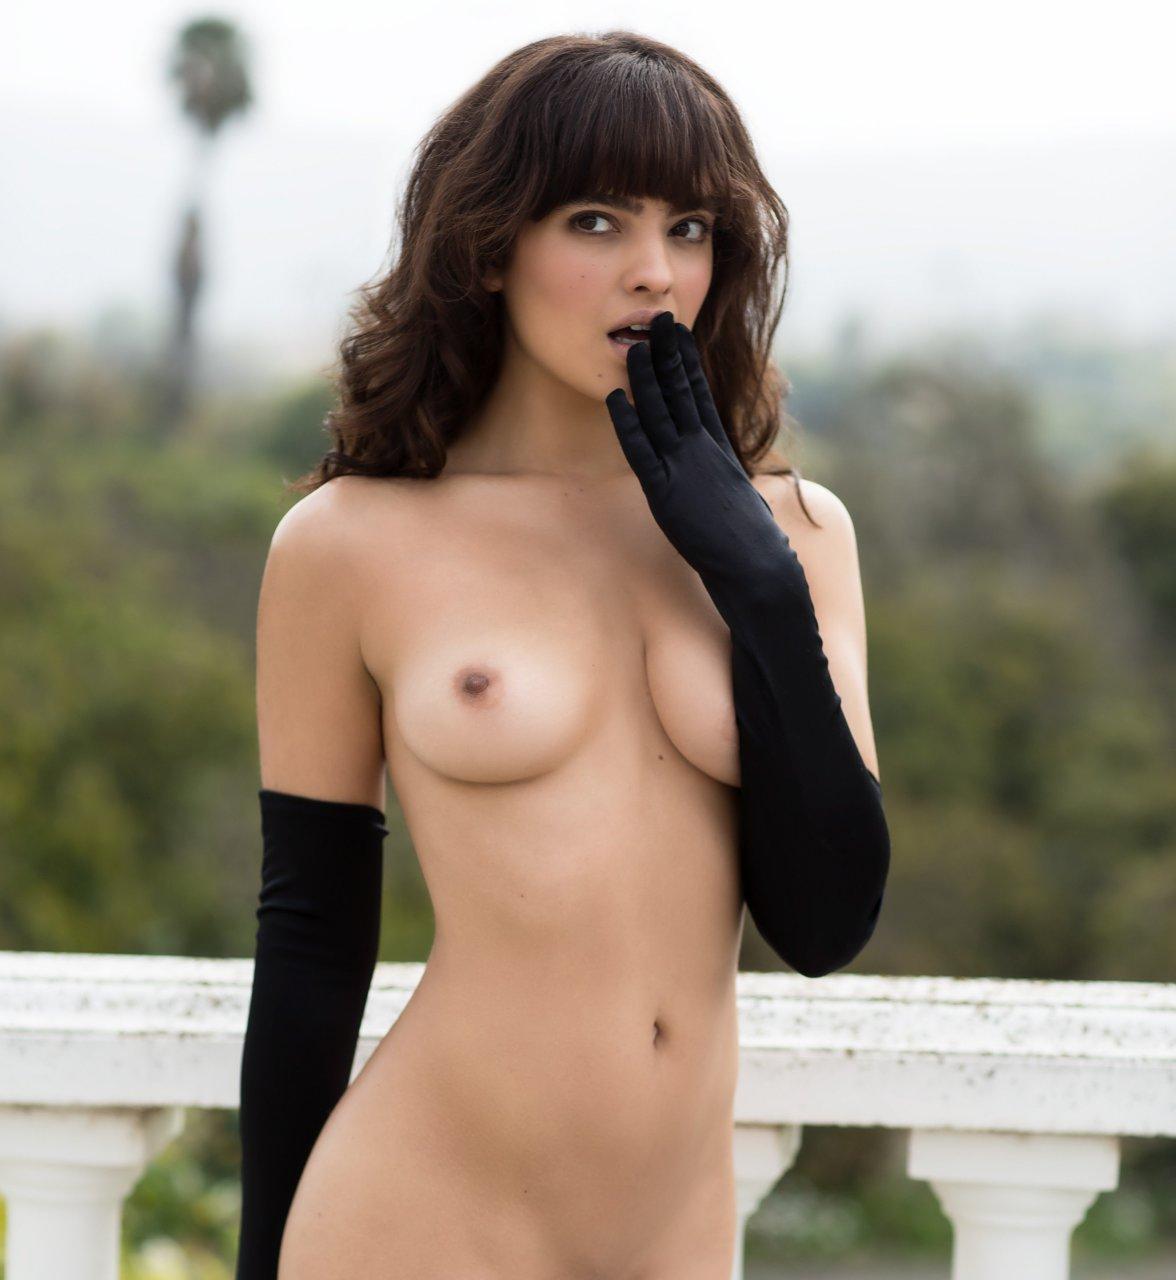 Nina nude pics